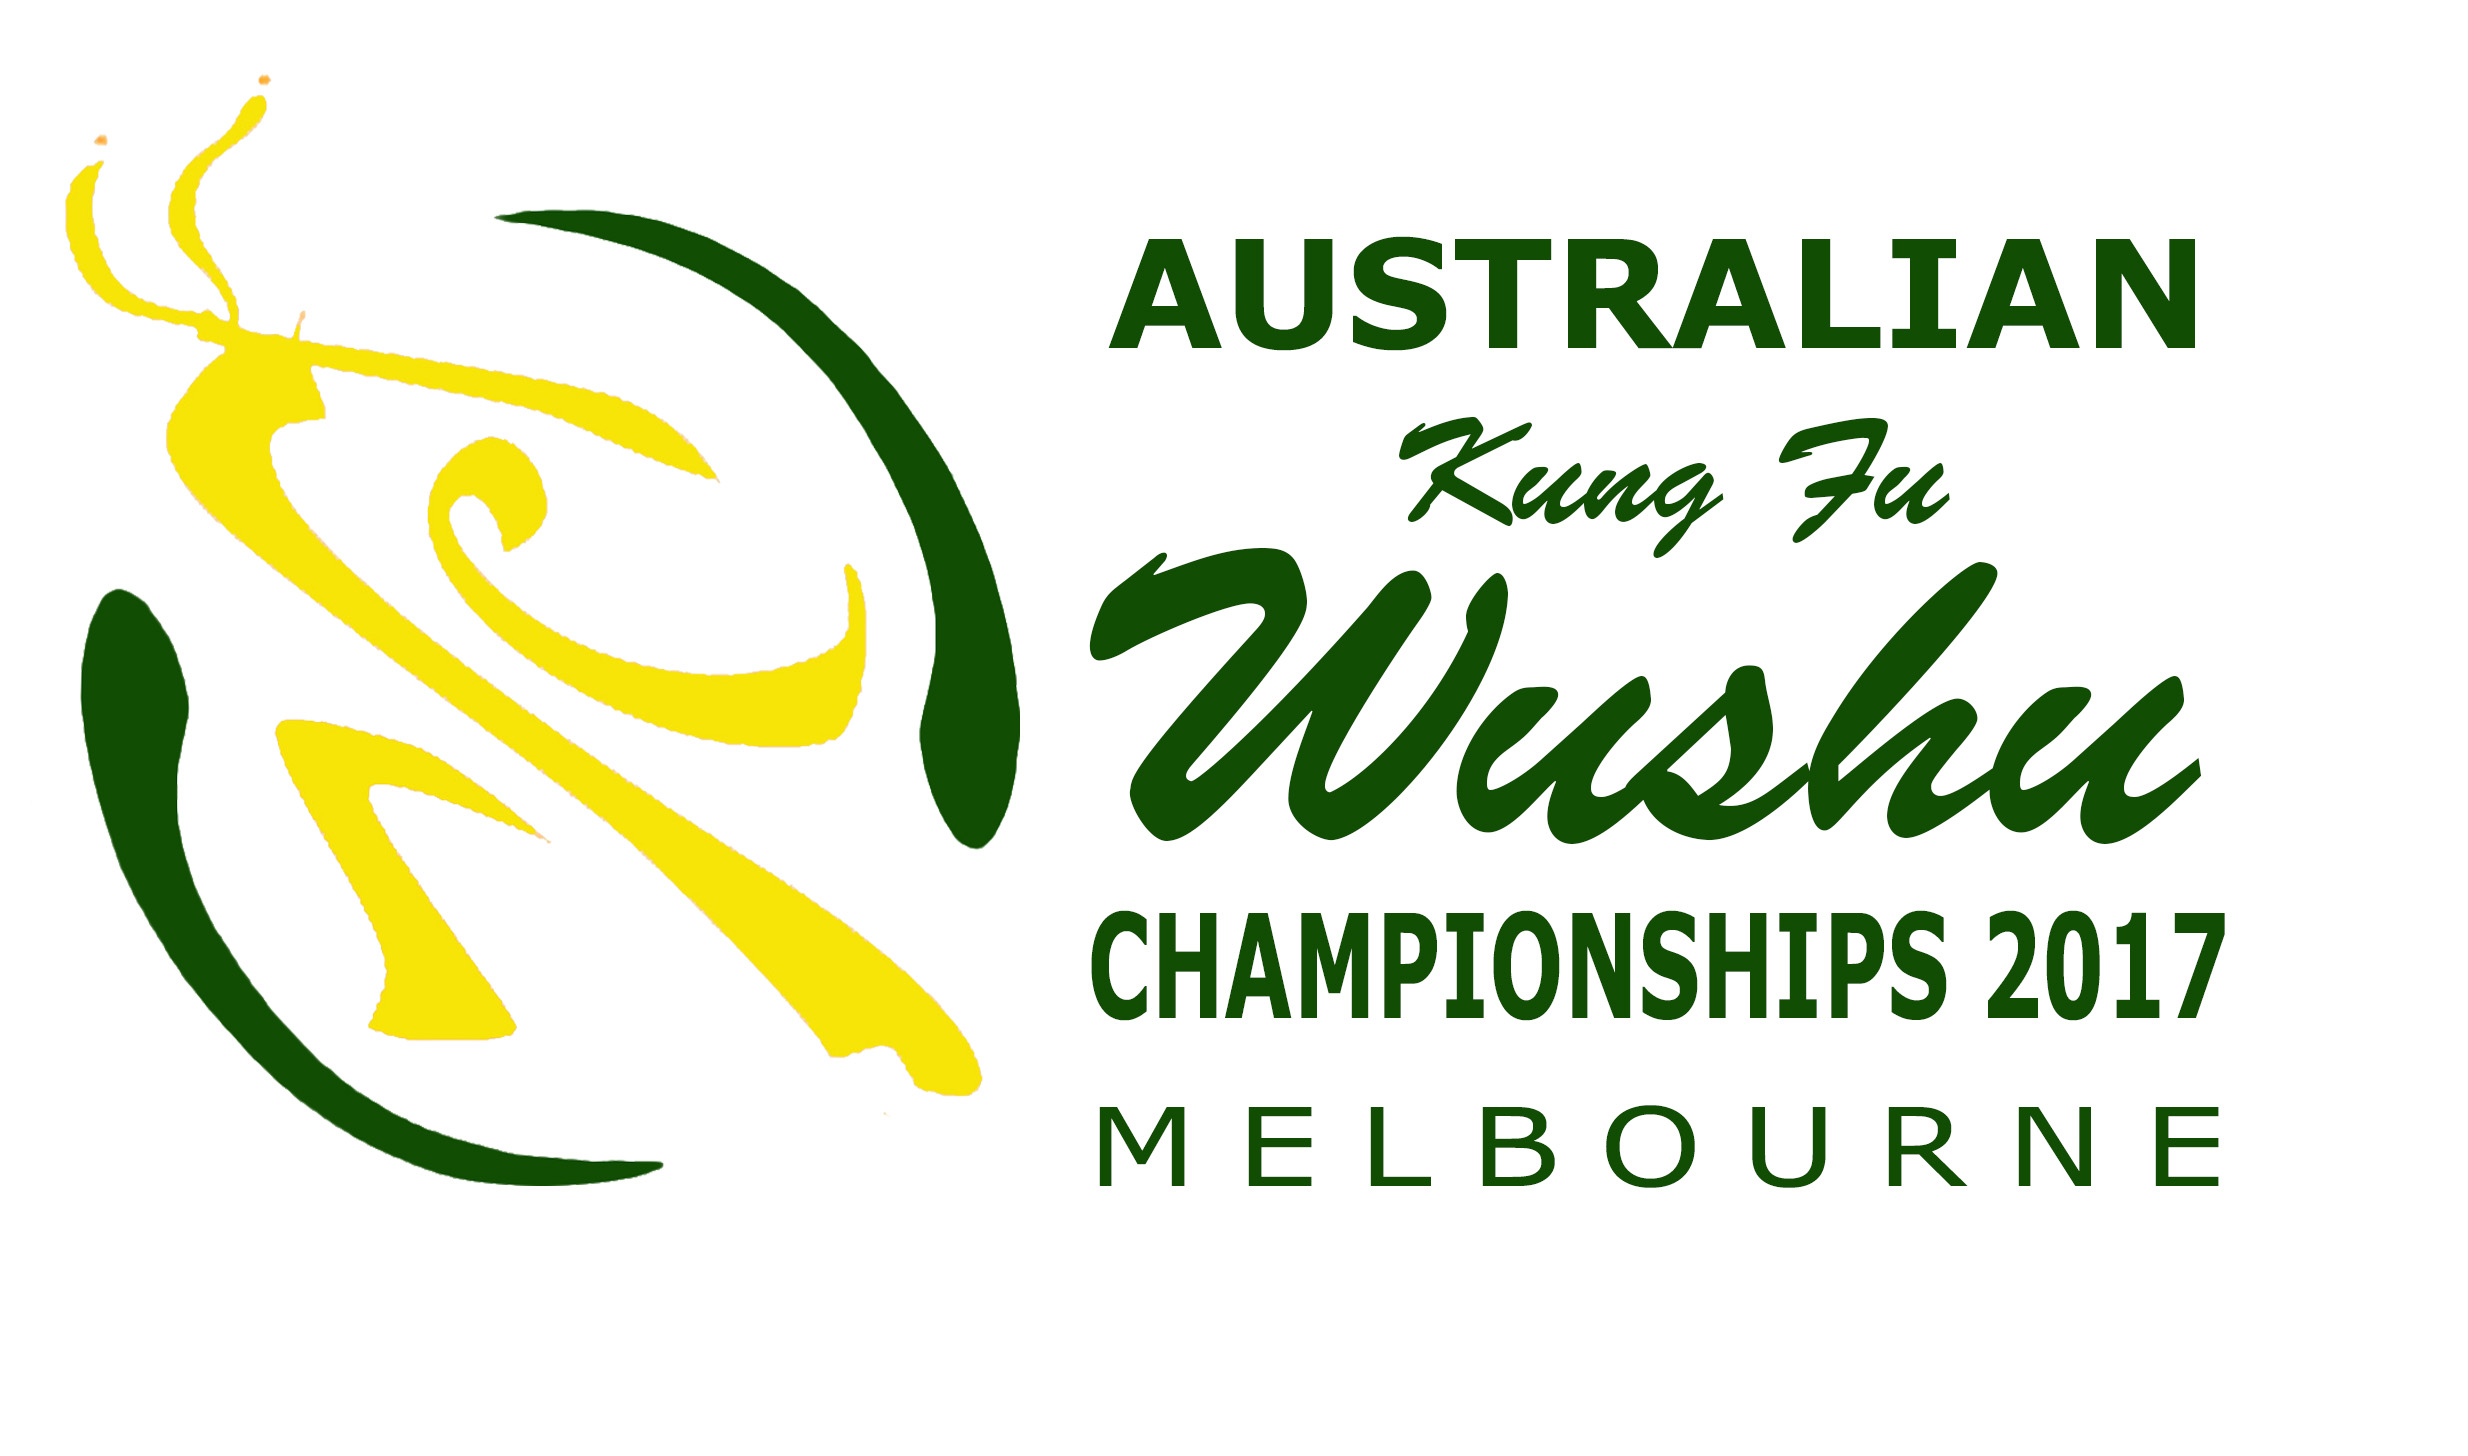 Australian Kung Fu Wushu Championship 2017 Kung Fu Wushu Victoria